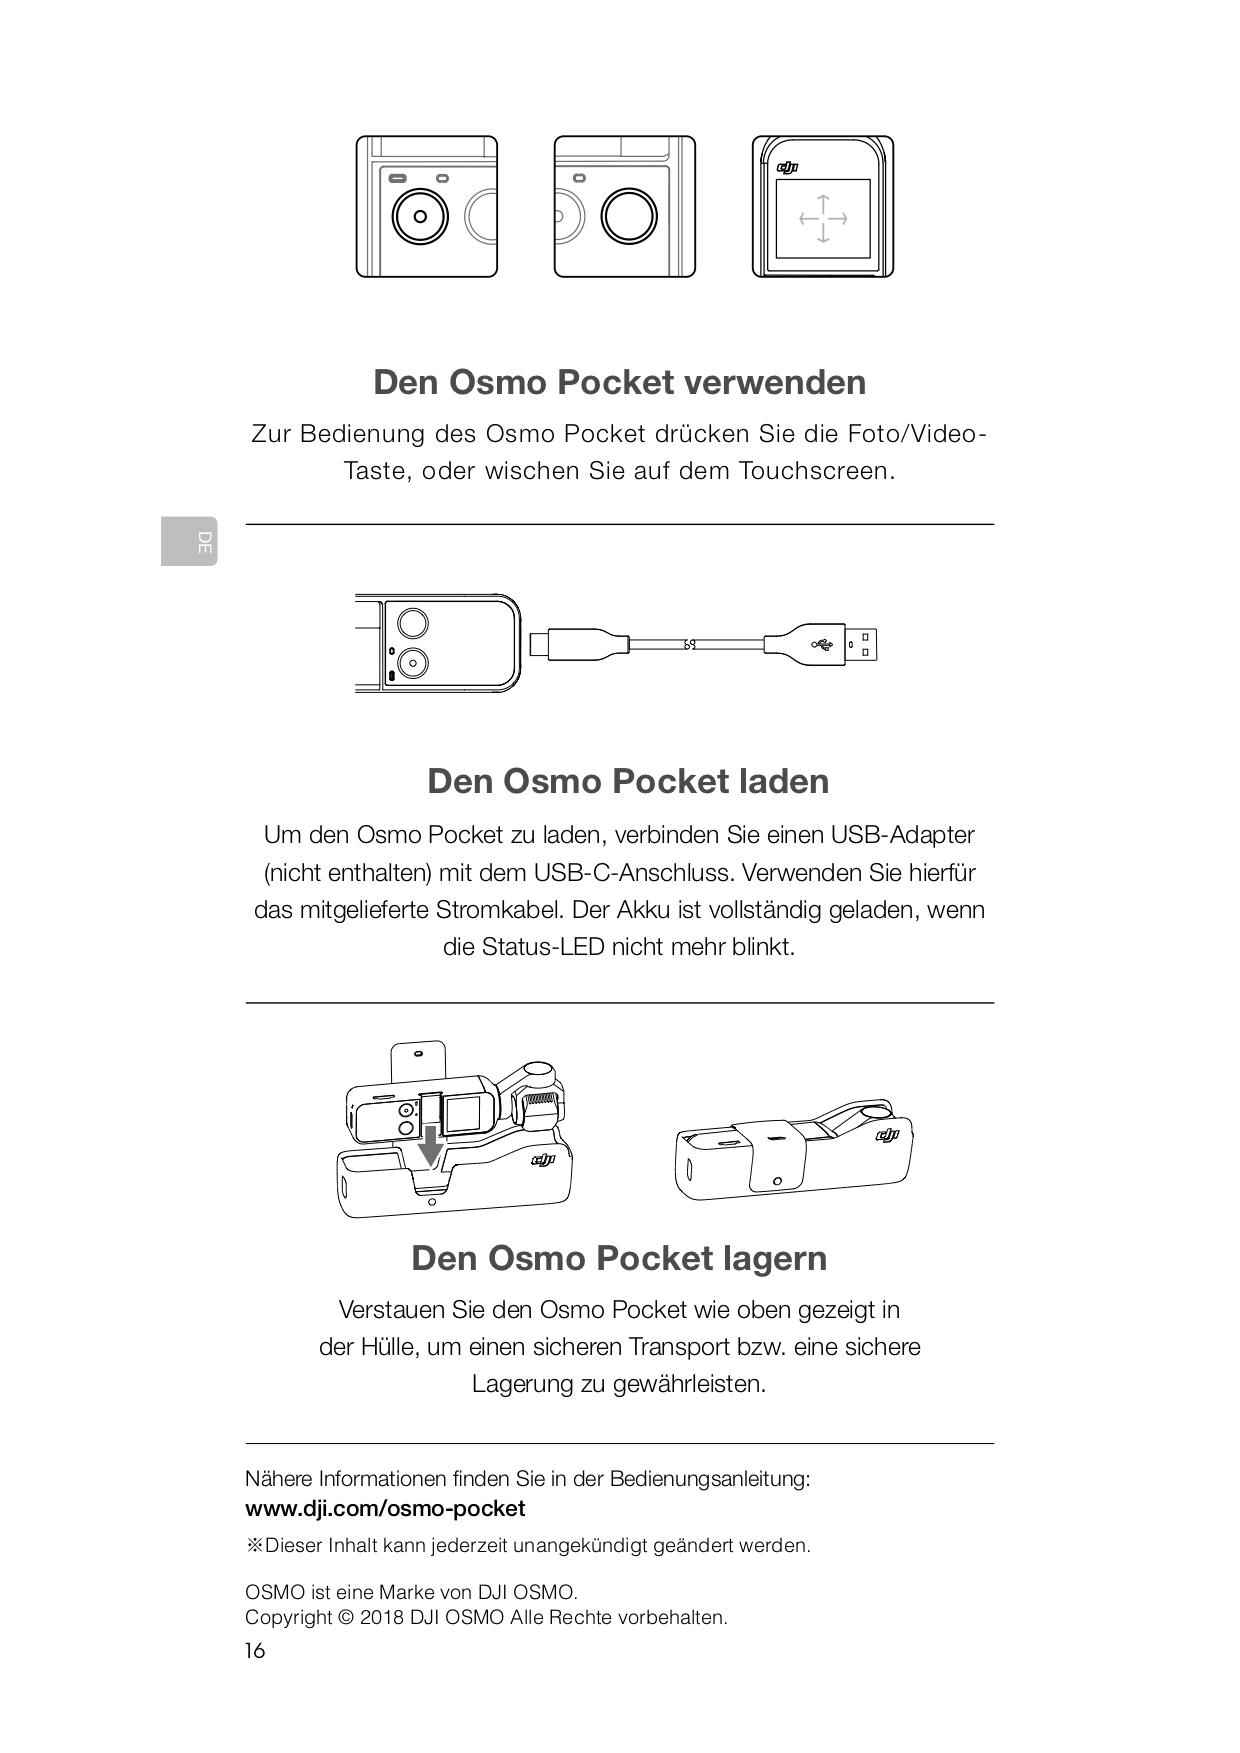 DJI Osmo Pocket verwenden